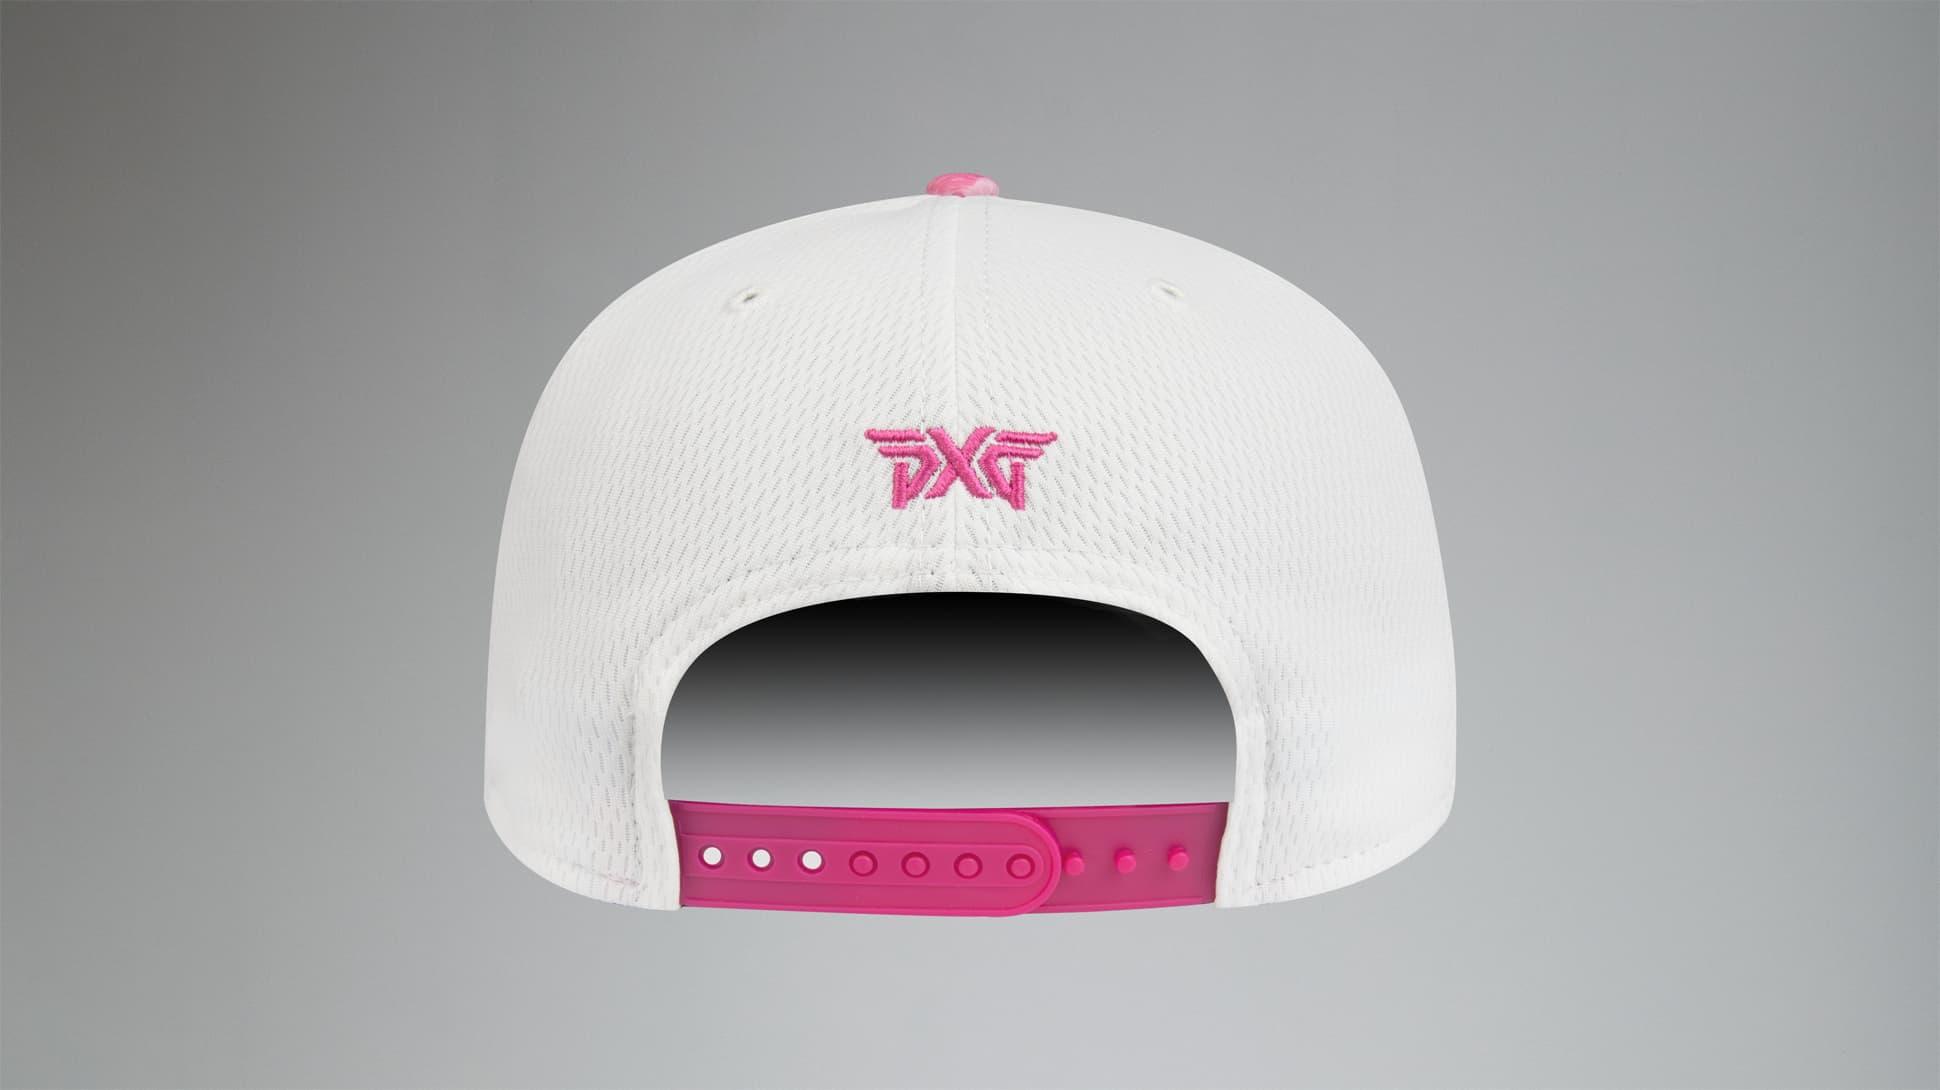 Fairway Camo™ Pink 9FIFTY Snapback Cap Image 3